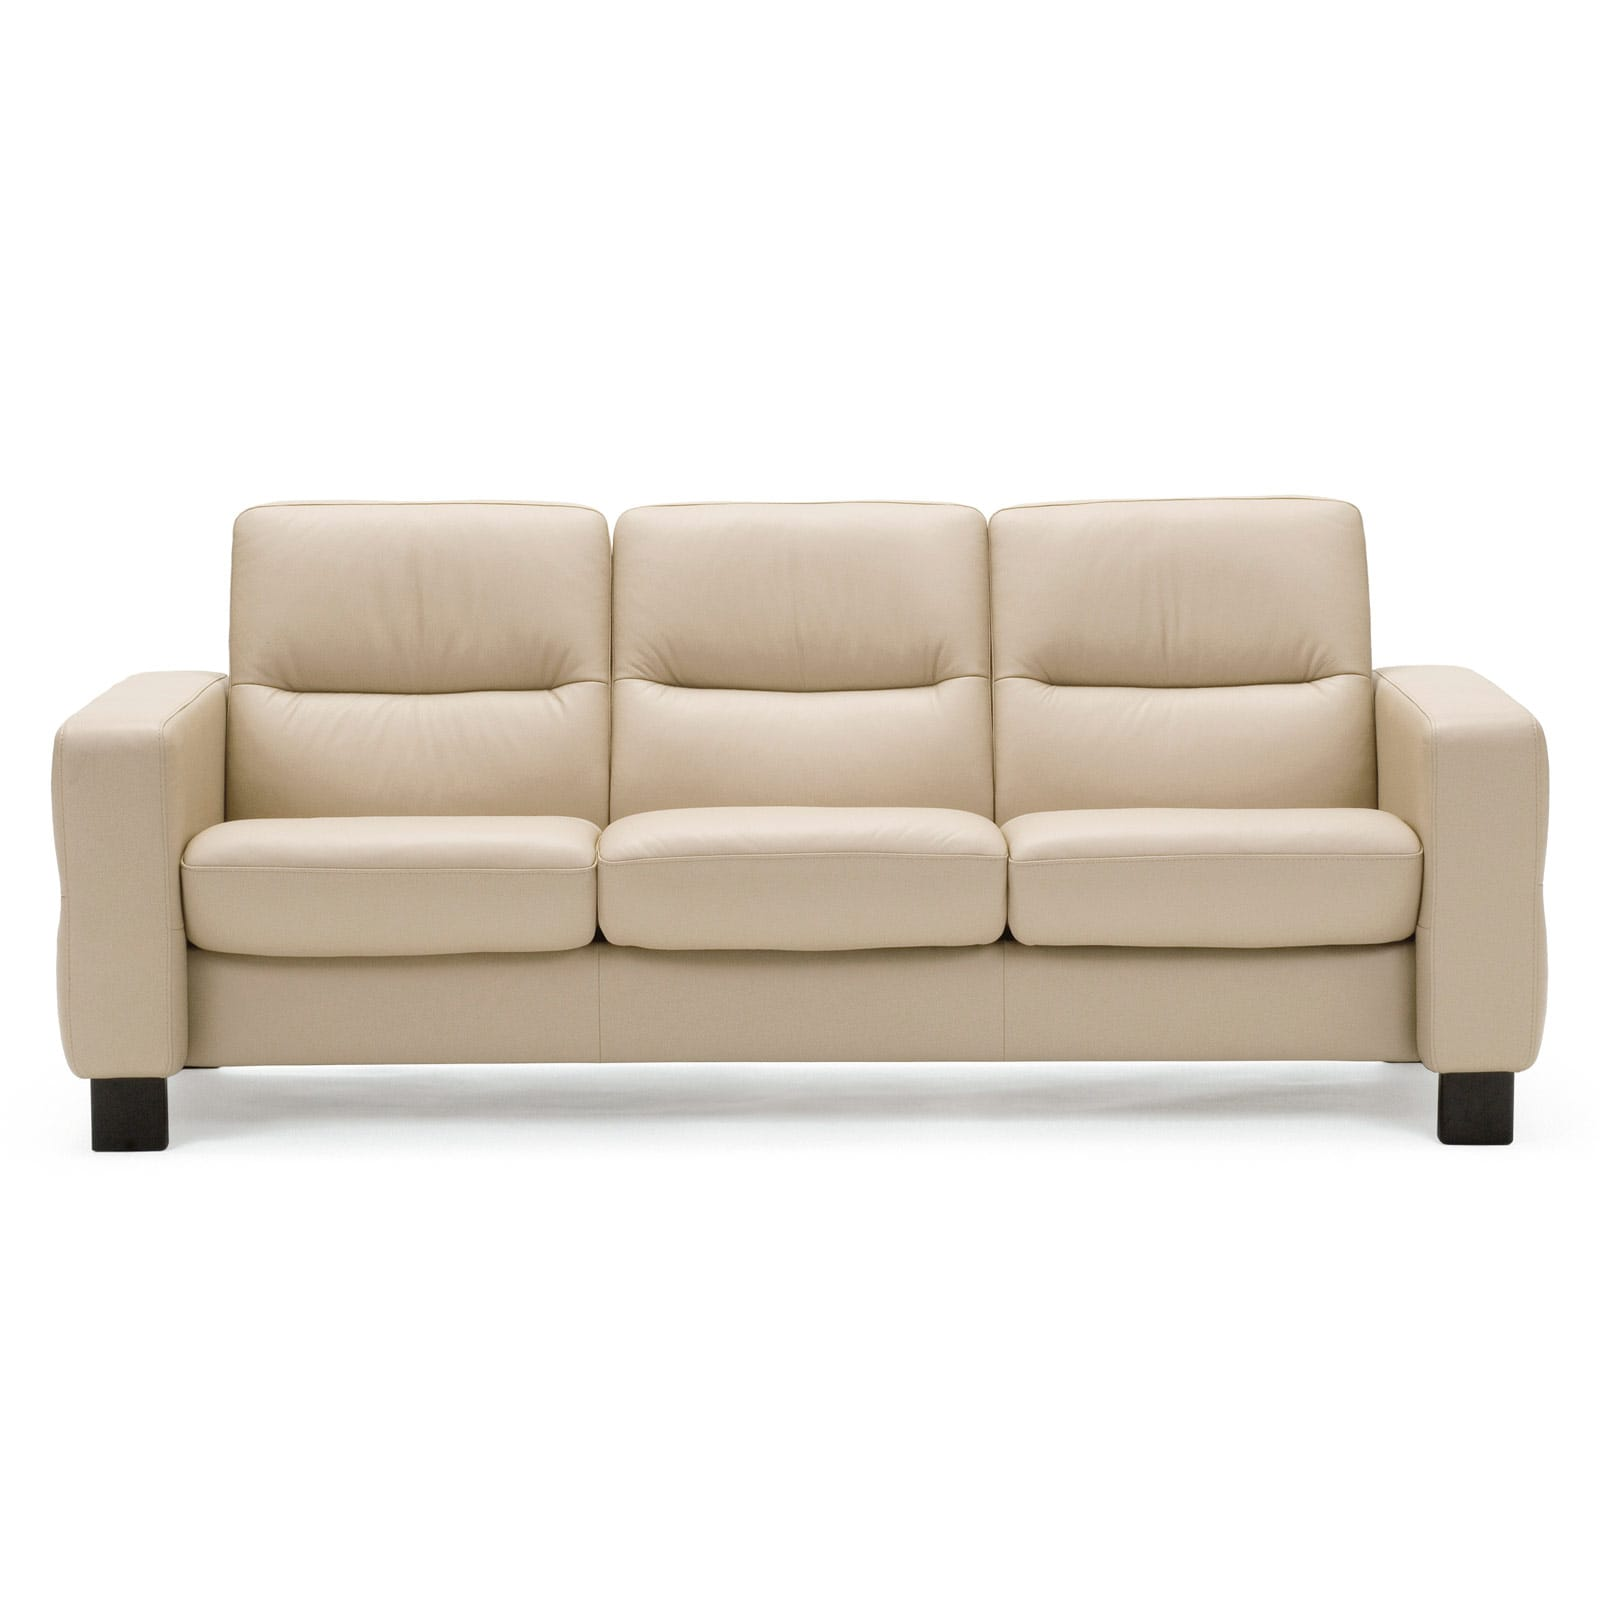 Full Size of Stressless Sofa 3 Sitzer Wave M Niedrig Batick Cream Auf Raten Polster Reinigen 2 Cassina Muuto Mit Abnehmbaren Bezug Schlafsofa Liegefläche 160x200 Sofa Stressless Sofa